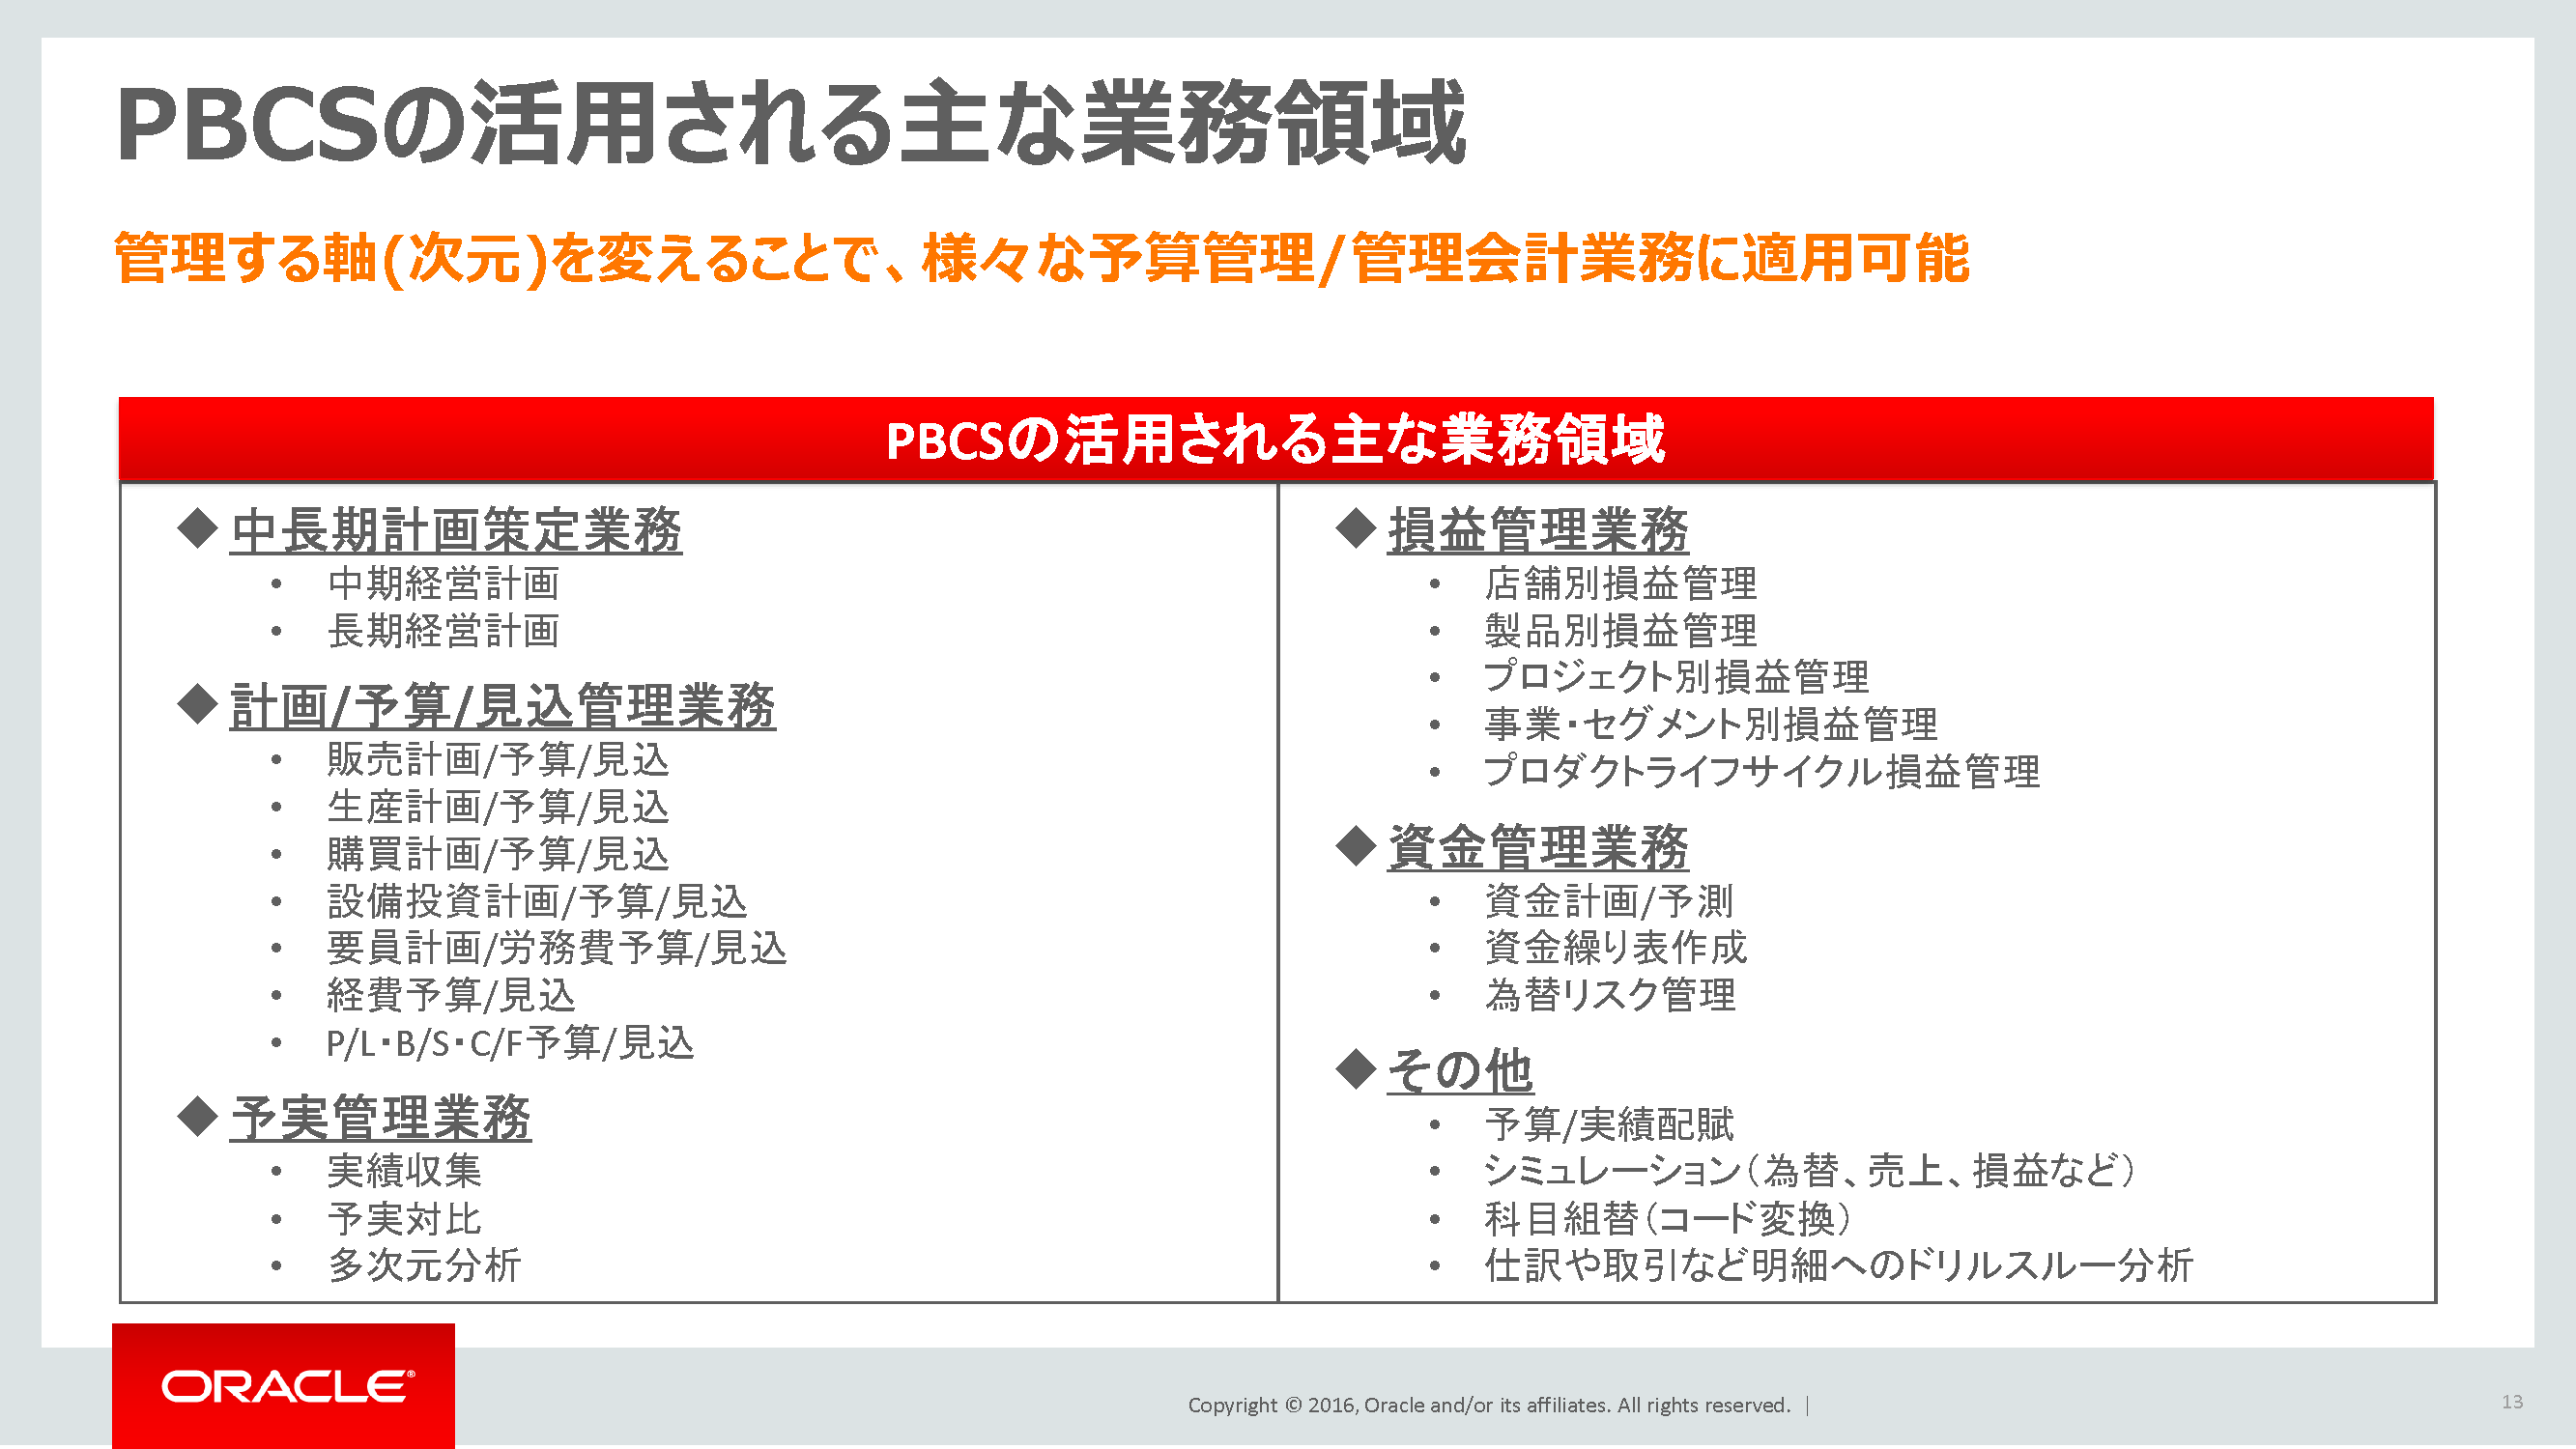 PBCSの業務支援領域